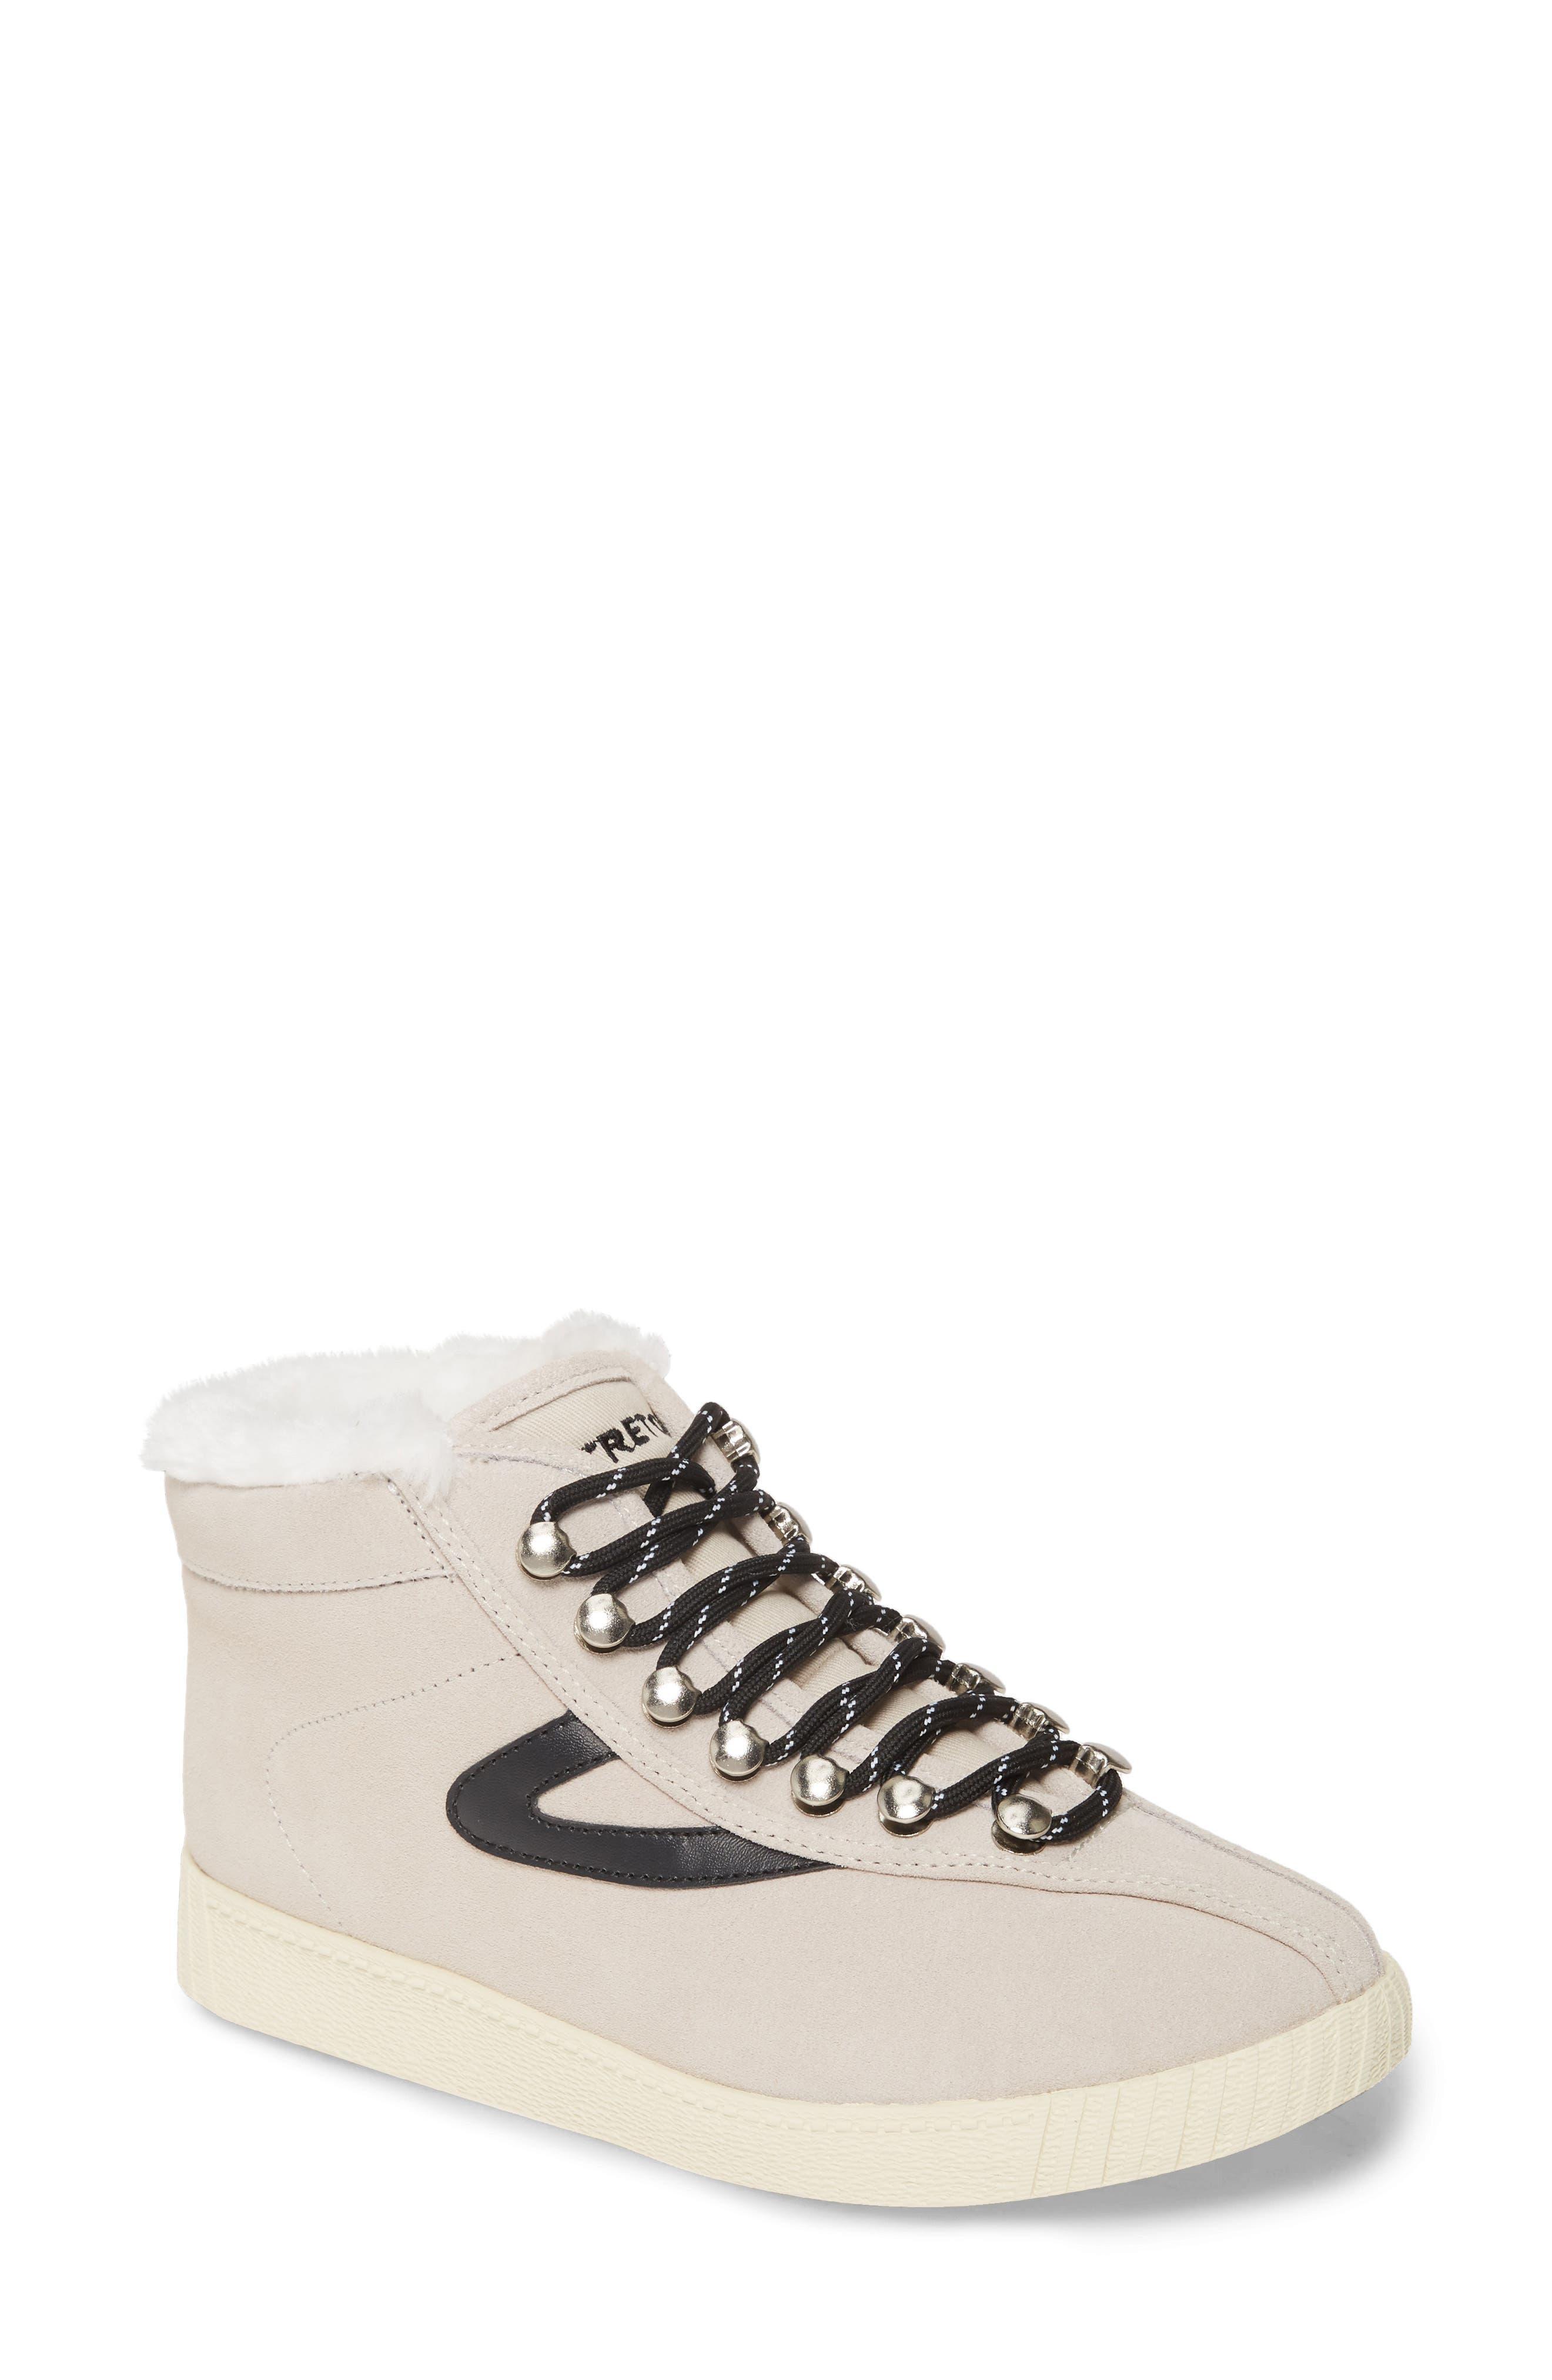 Image of Tretorn Nylite Hi 50 Sneaker